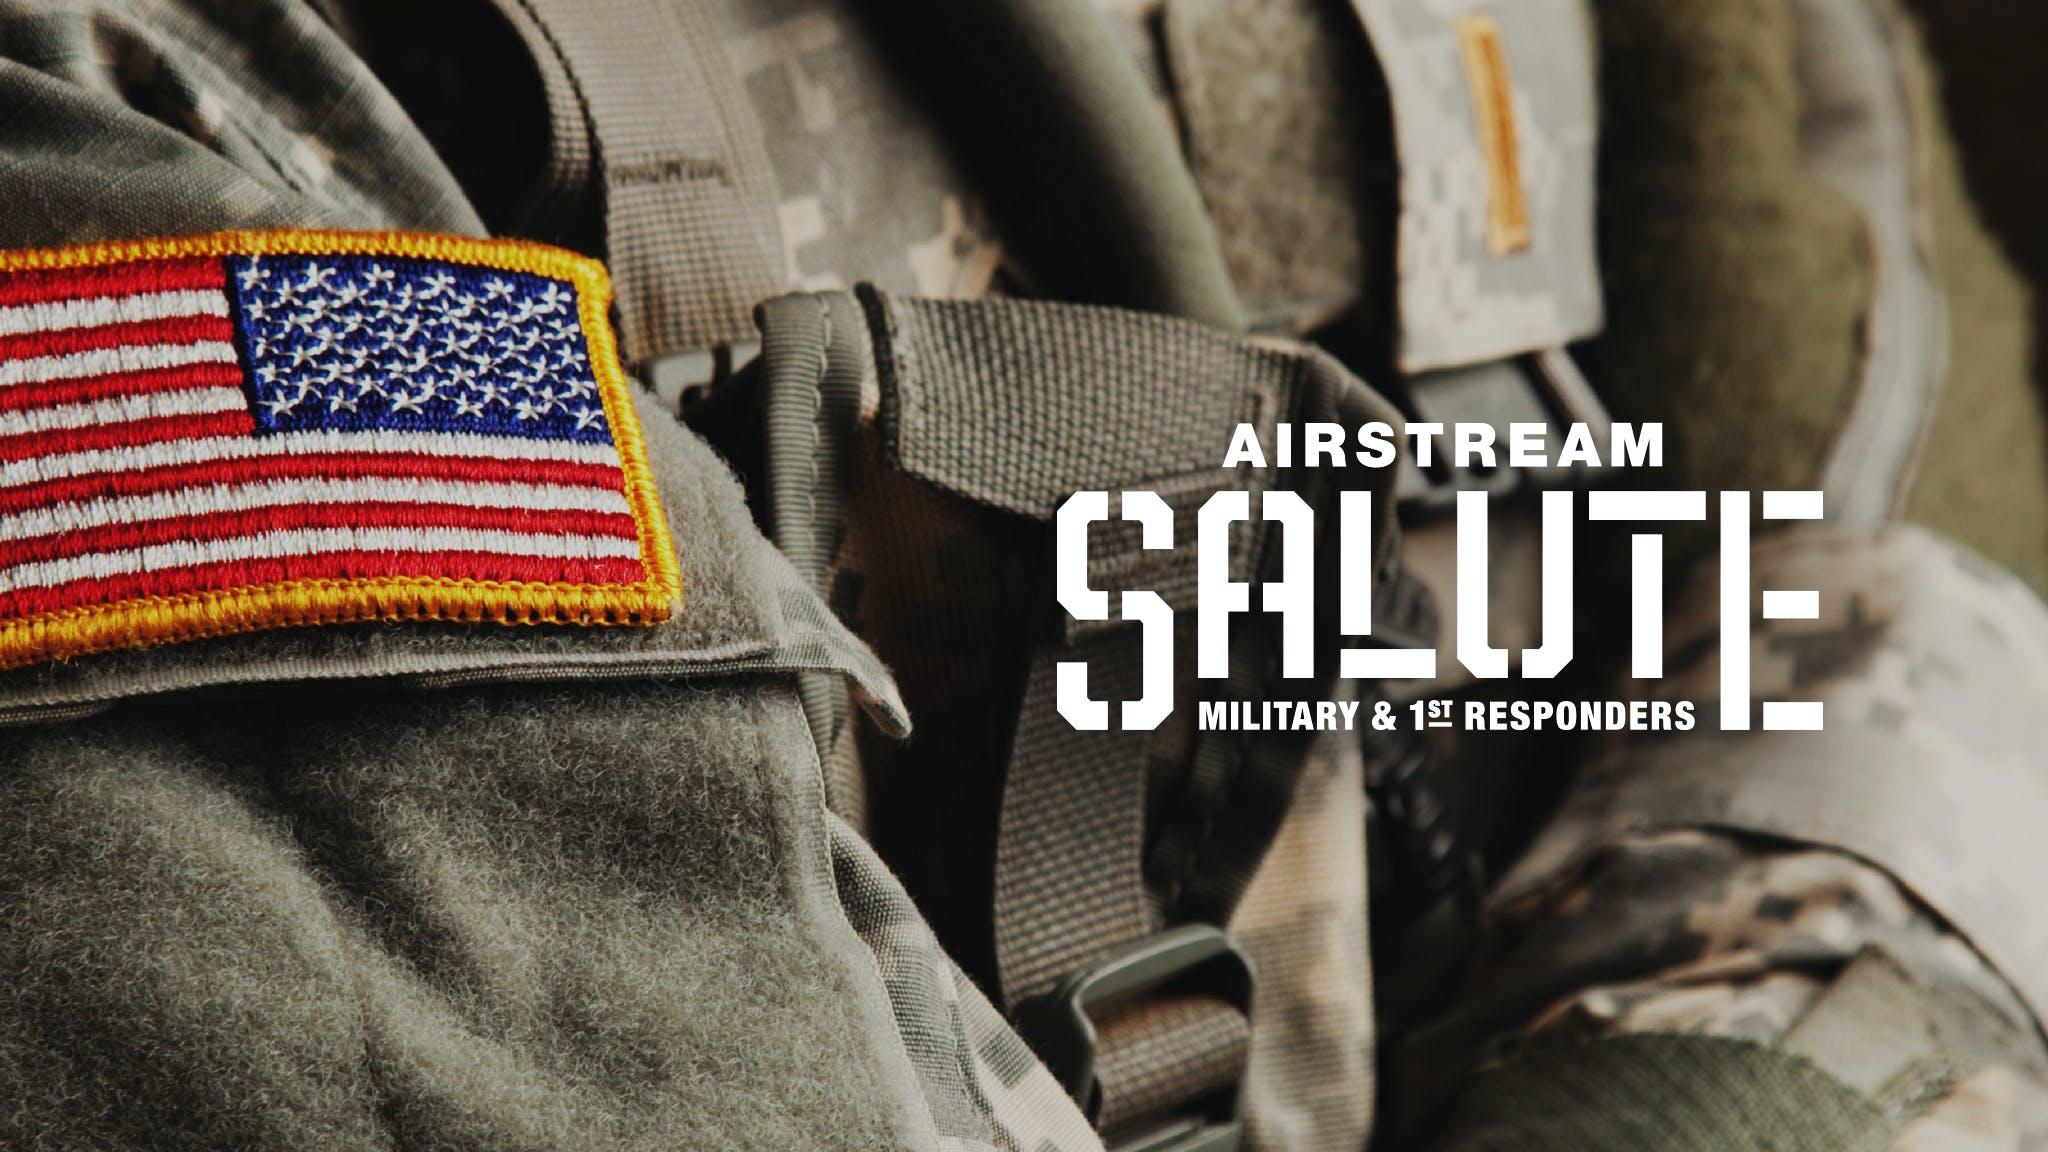 AirstreamSalute2